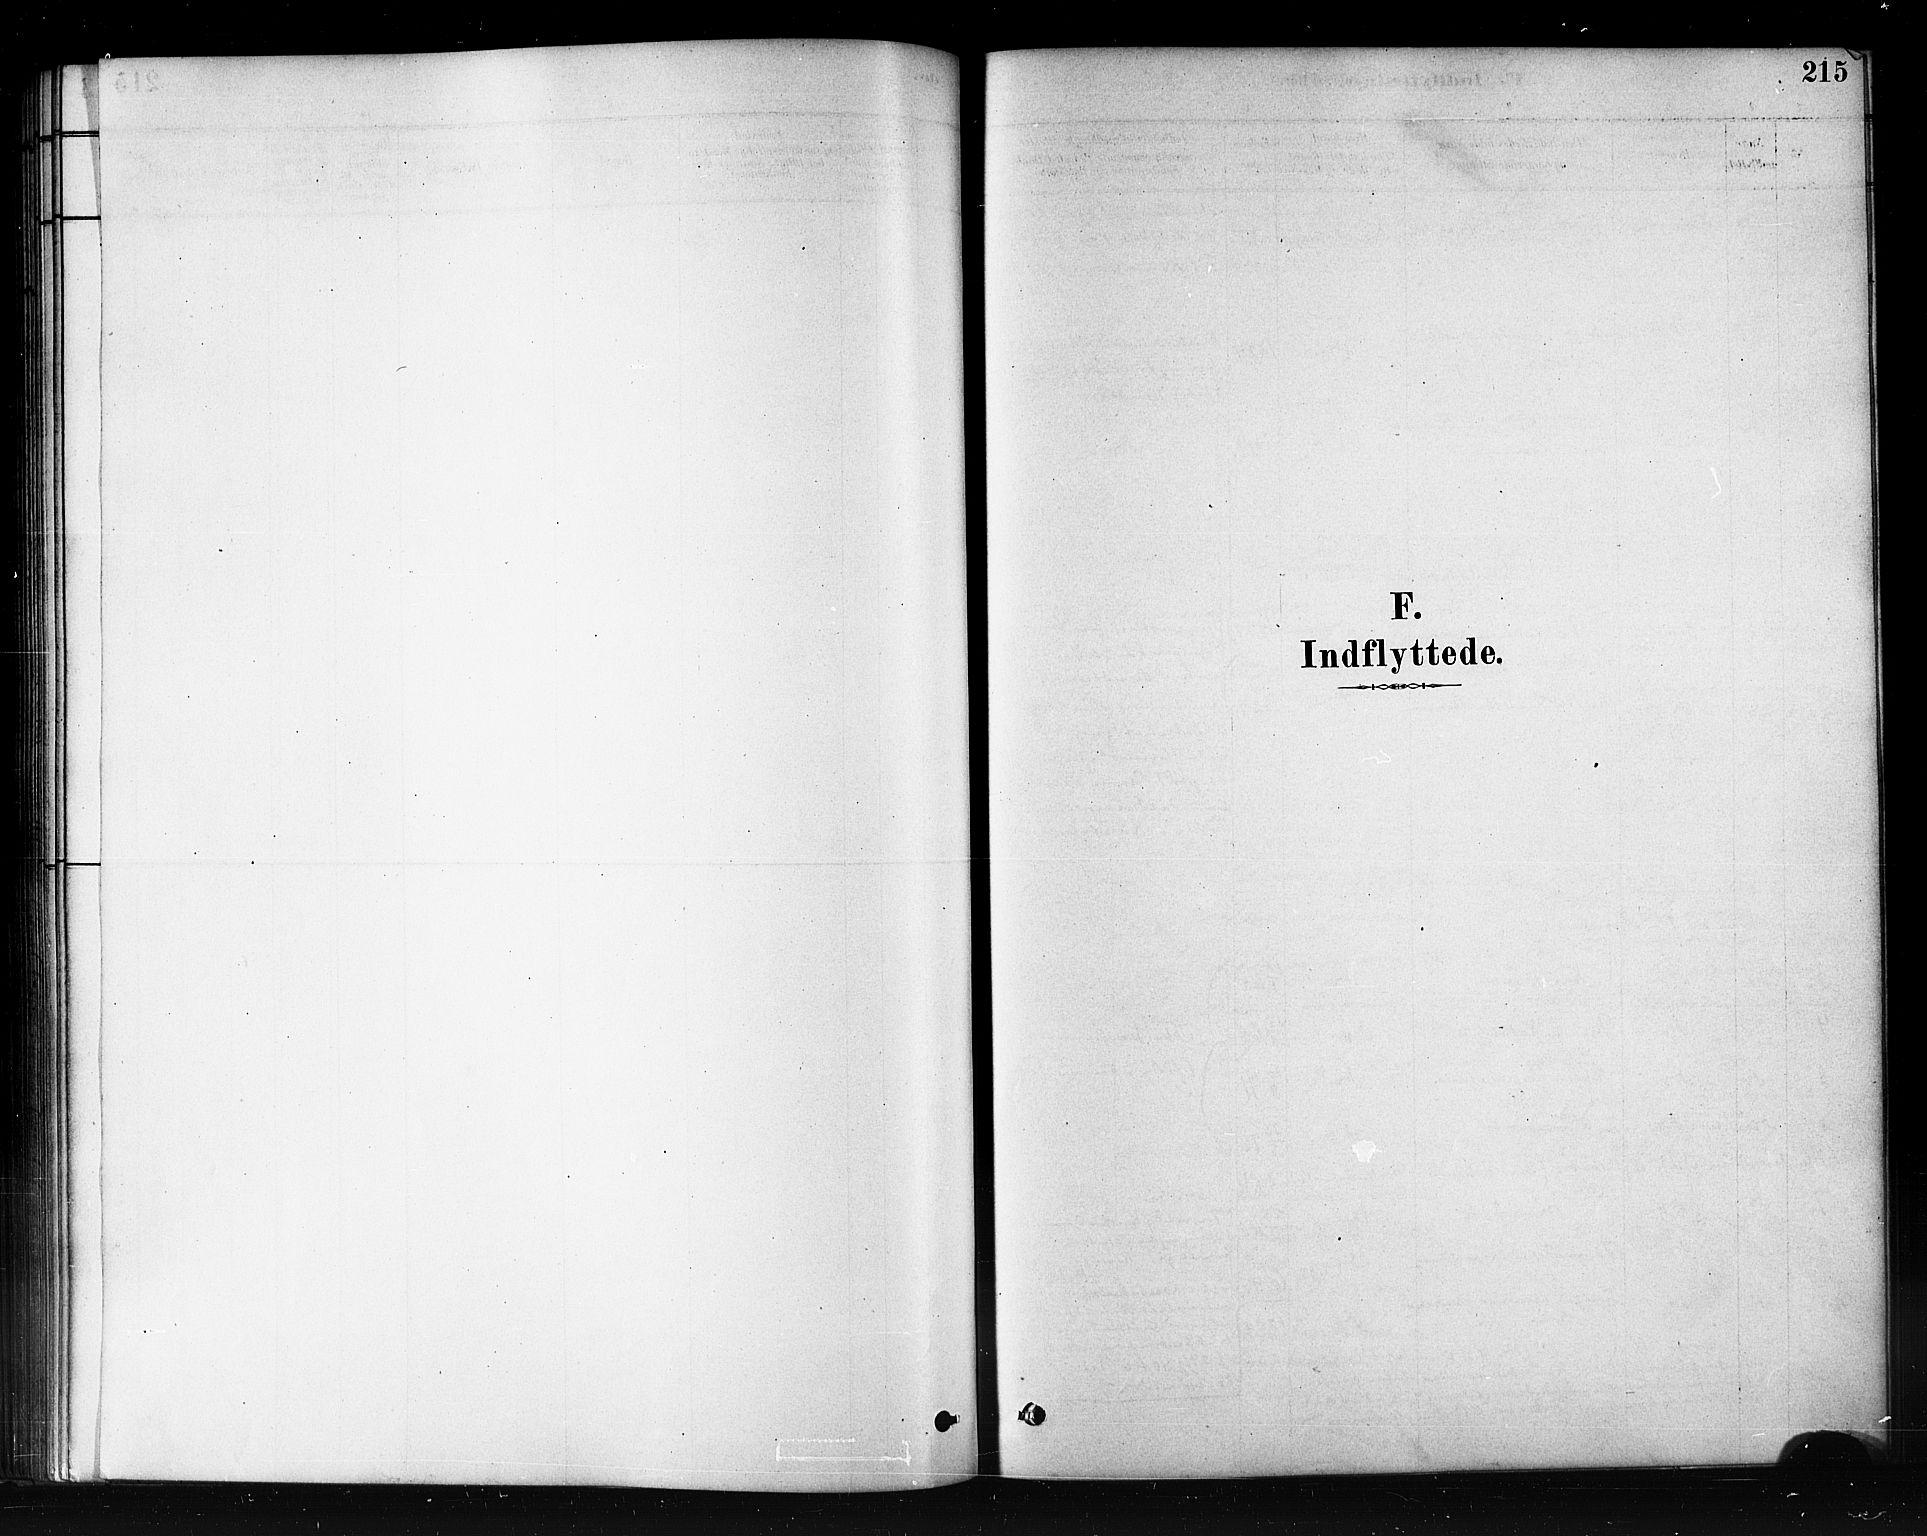 SATØ, Kautokeino sokneprestembete, H/Hb/L0002.klokk: Klokkerbok nr. 2, 1877-1896, s. 215